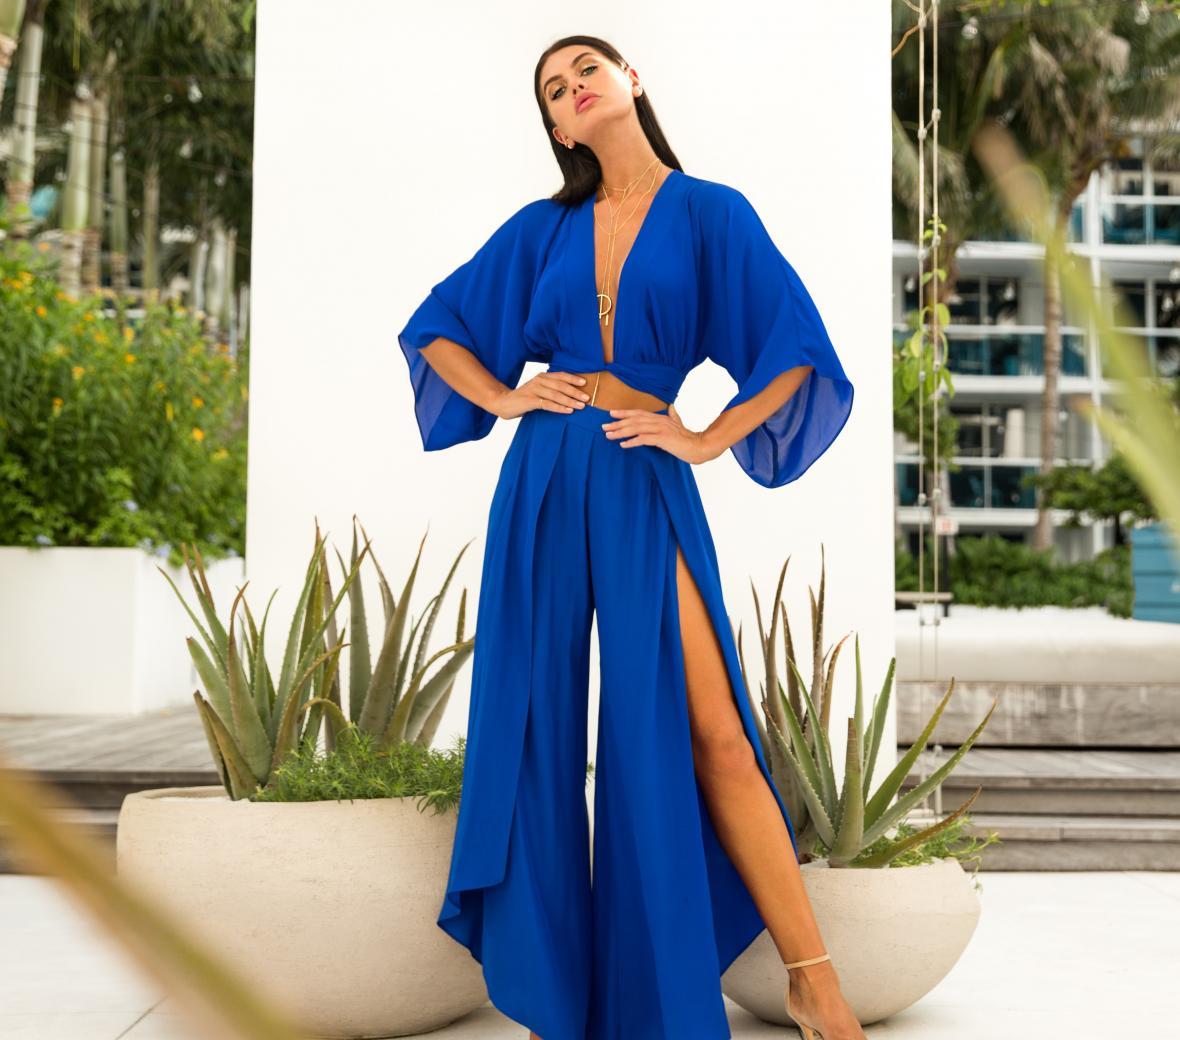 Woman posing in Big Drop NYC blue dress